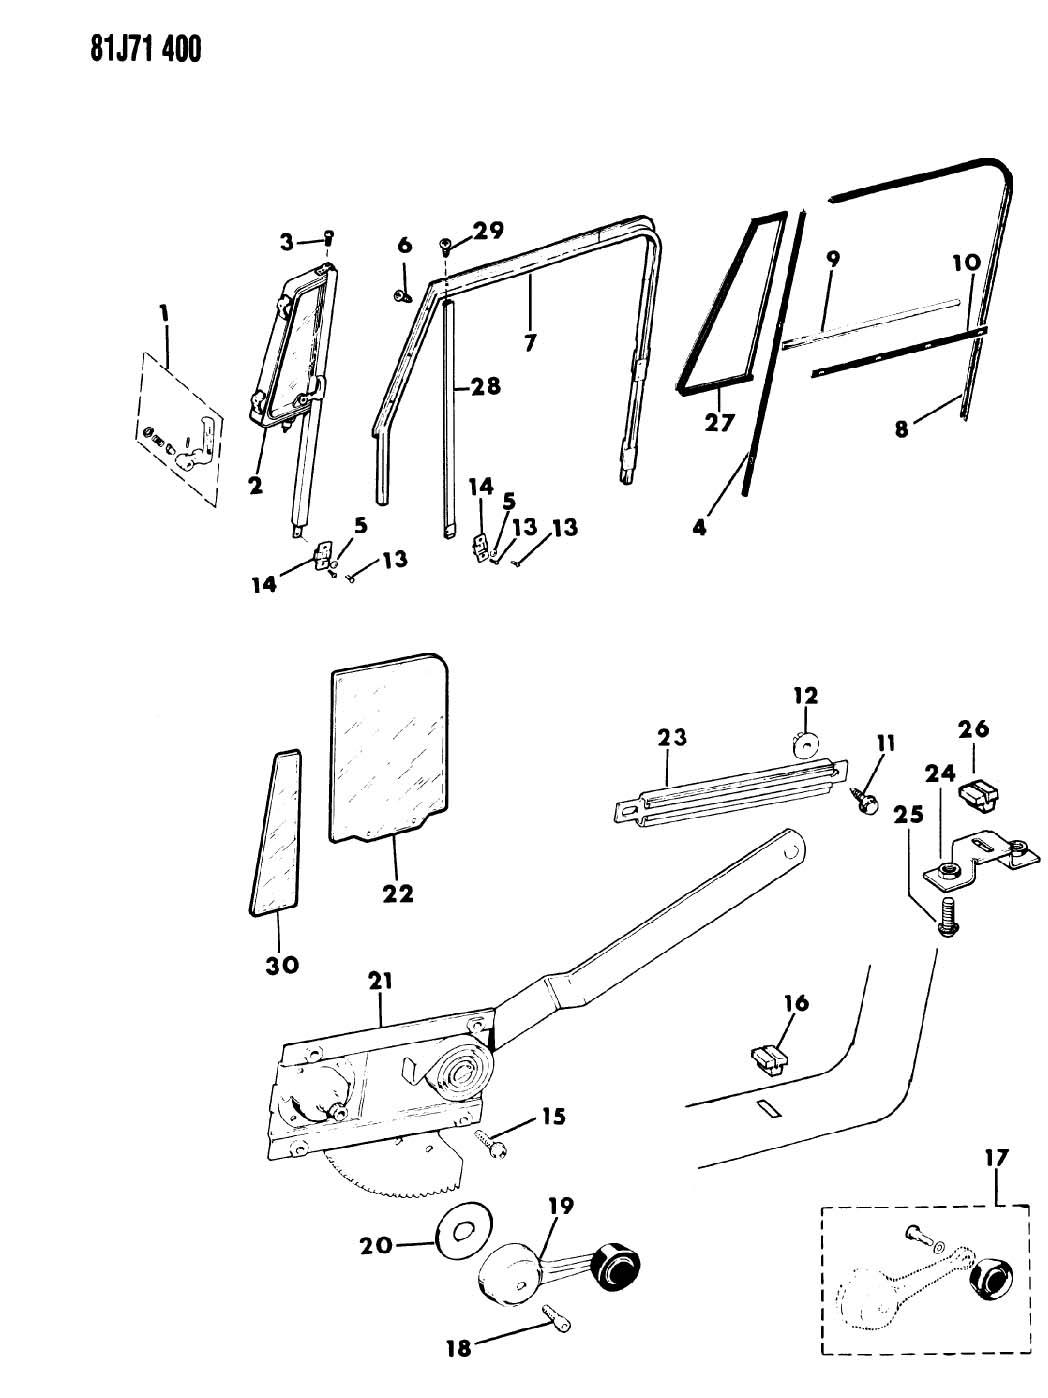 Jeep Wrangler DOORS, FULL, FRONT GLASS AND REGULATOR CJ-7,8